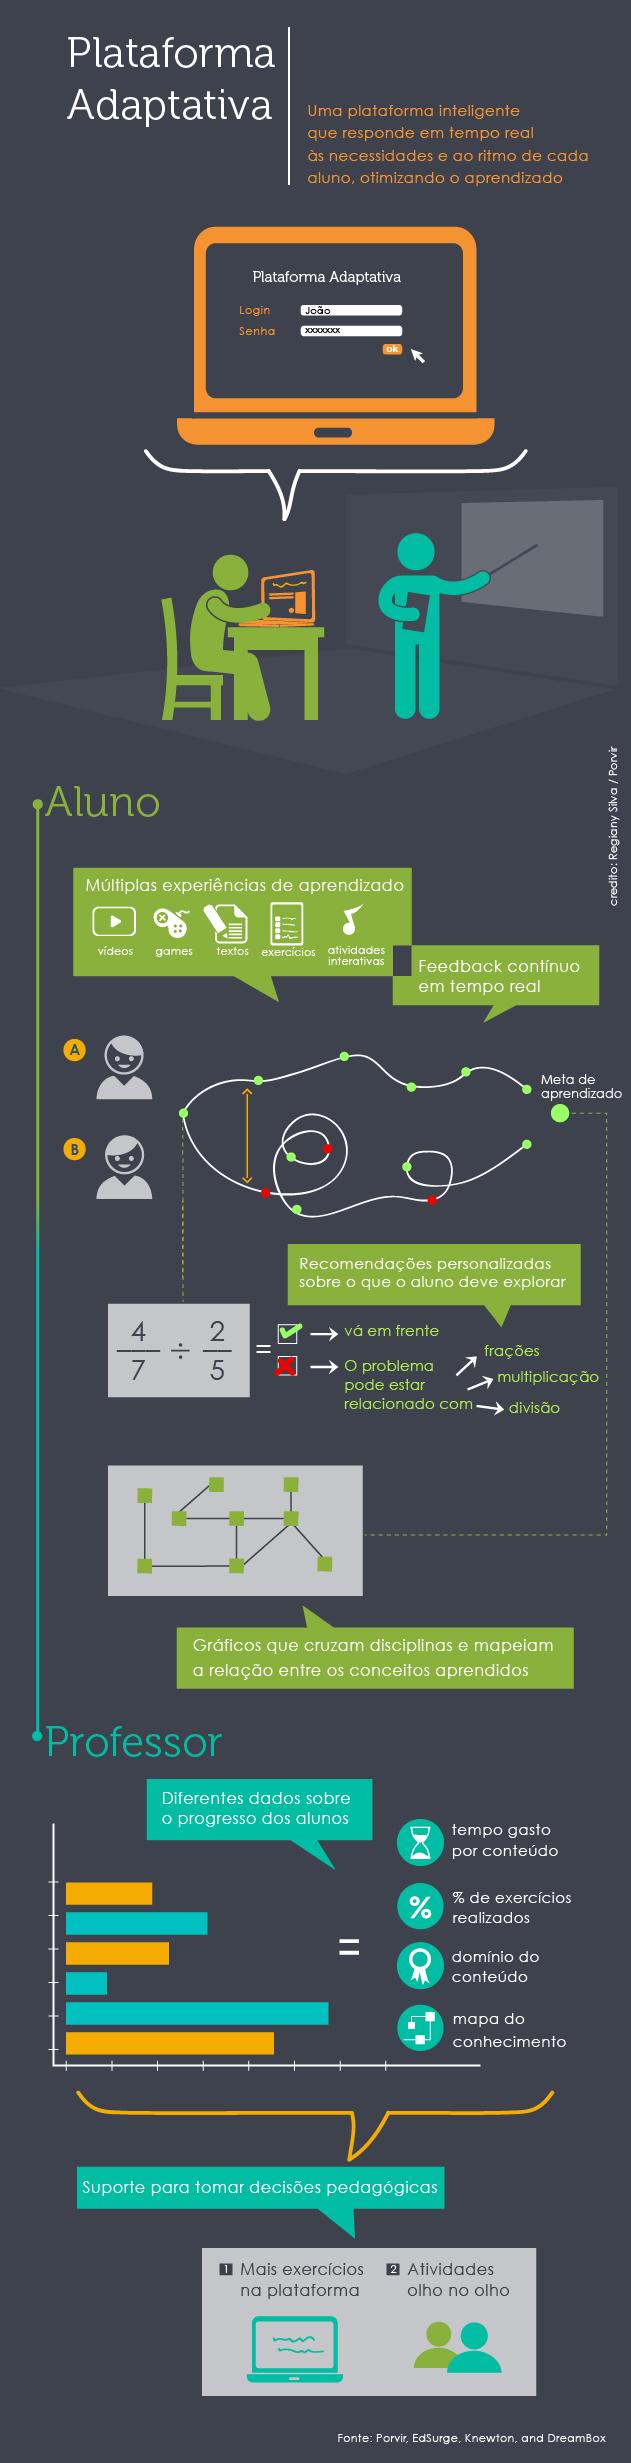 Infográfico Plataforma Adaptativa Porvir